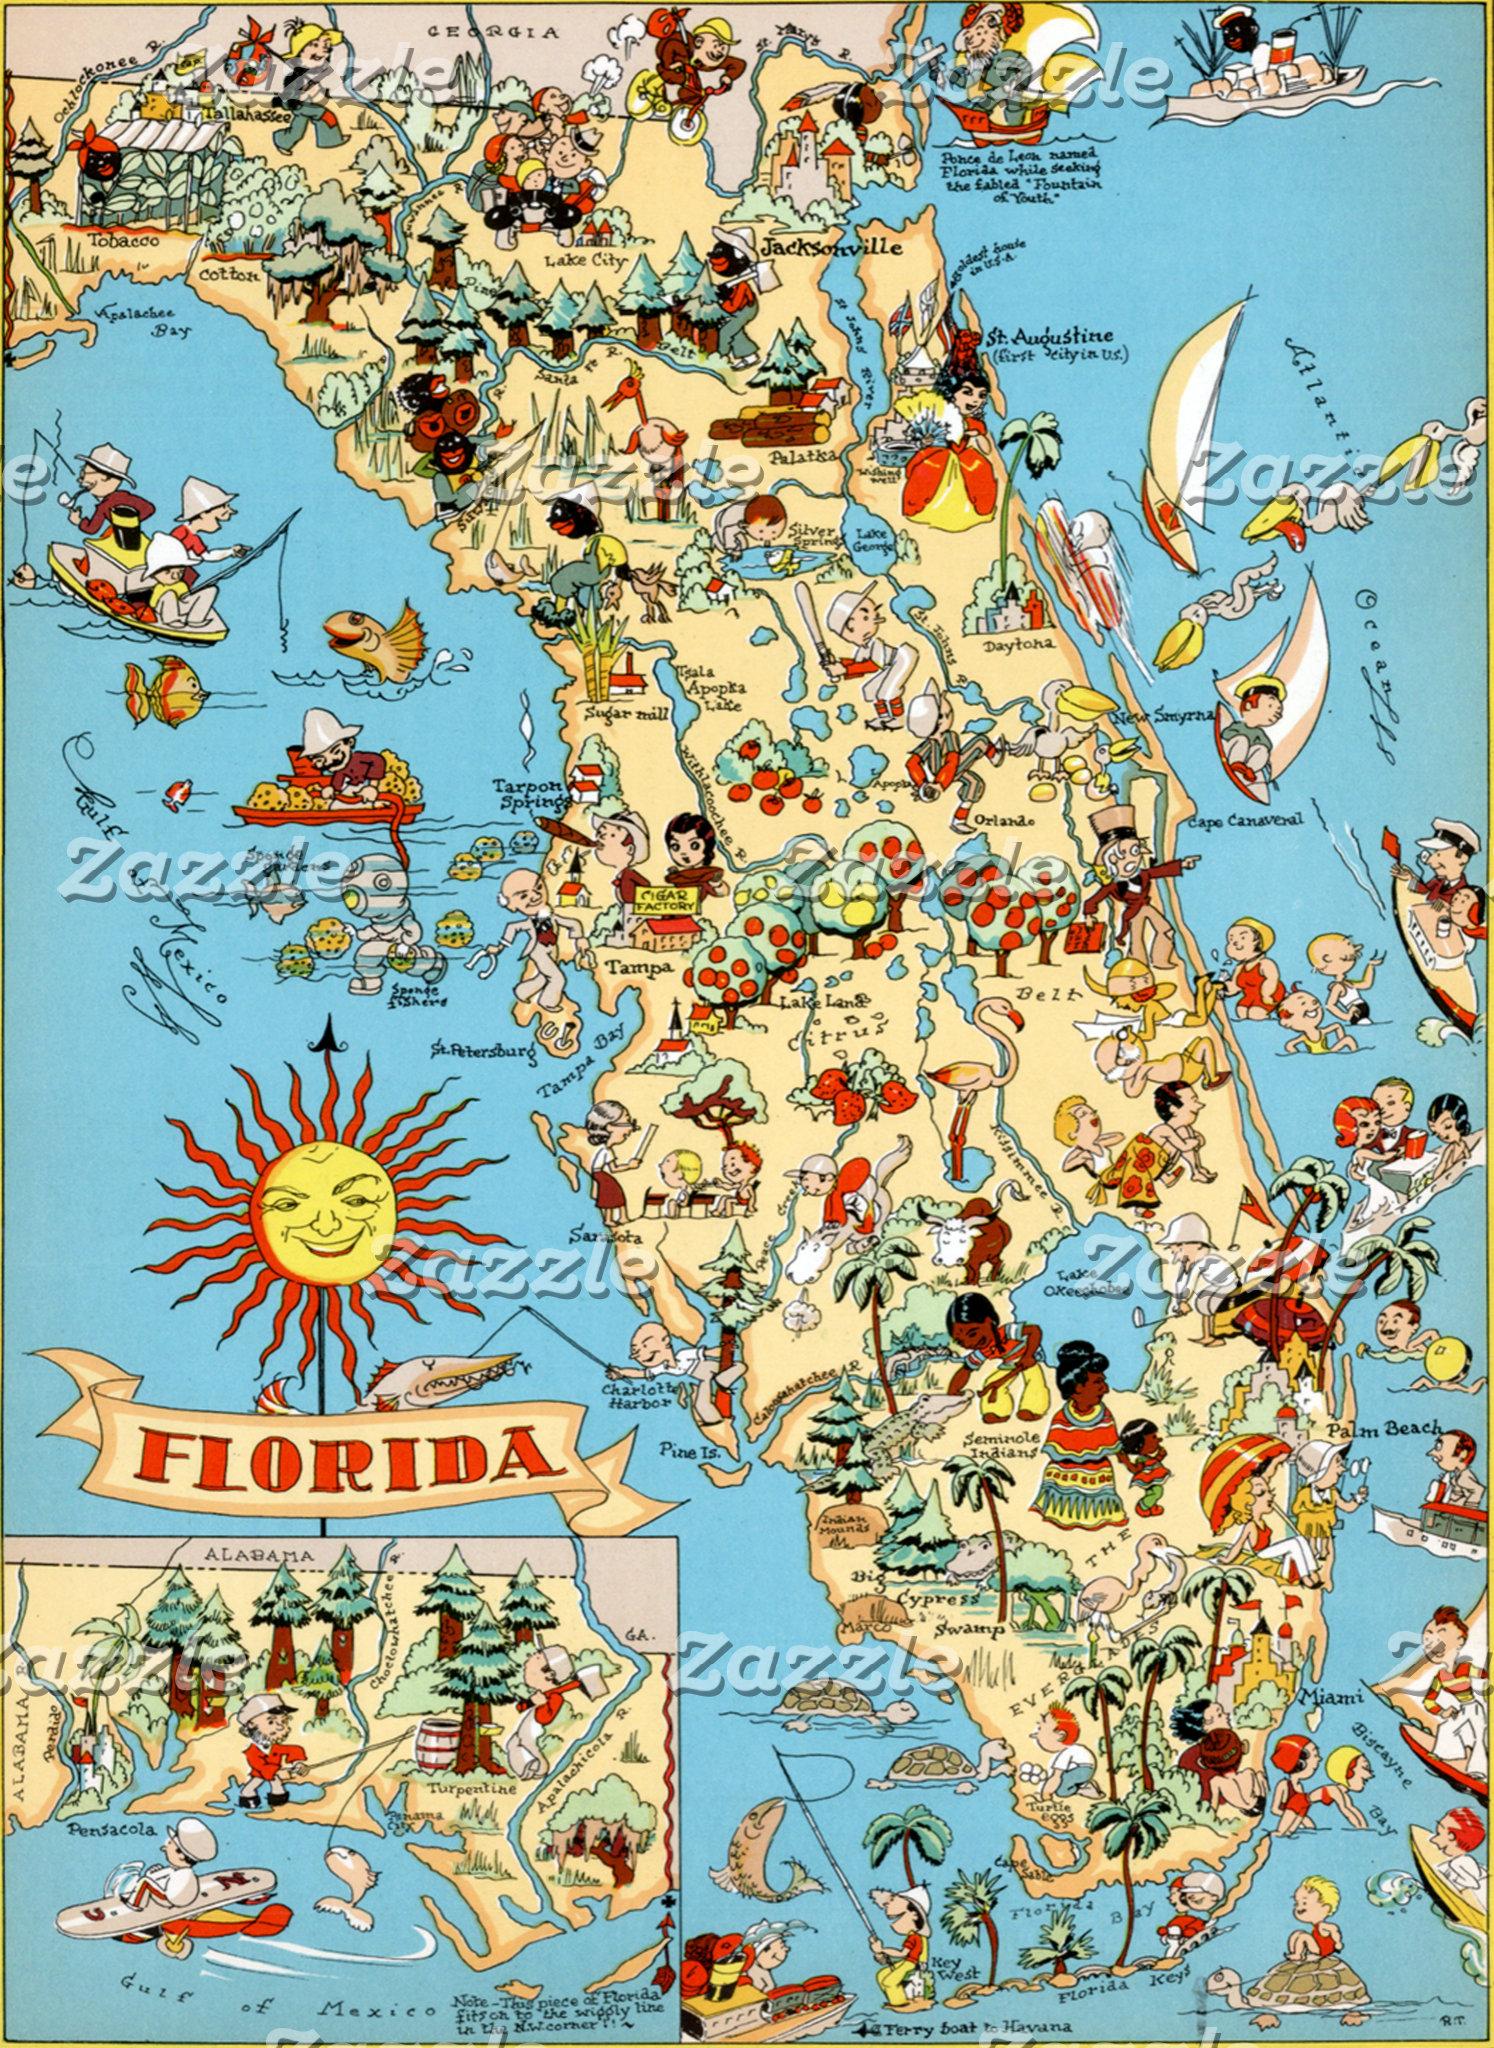 State Maps - Prints